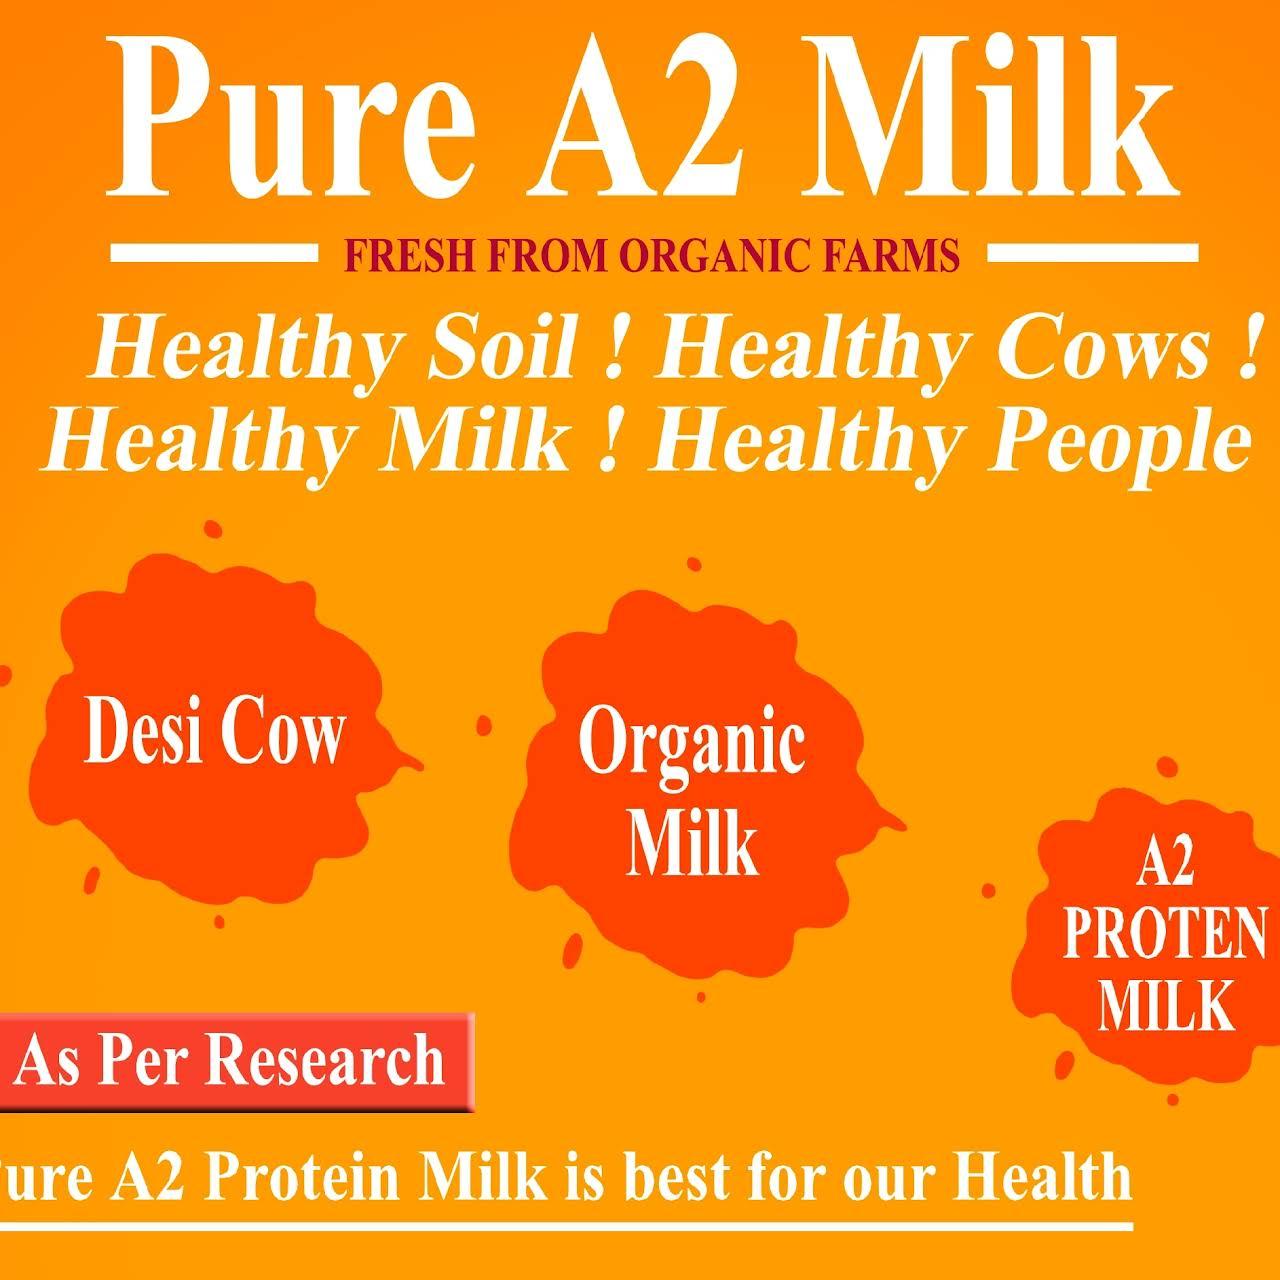 Puduvai A2 Milk - Dairy Farm in Puducherry